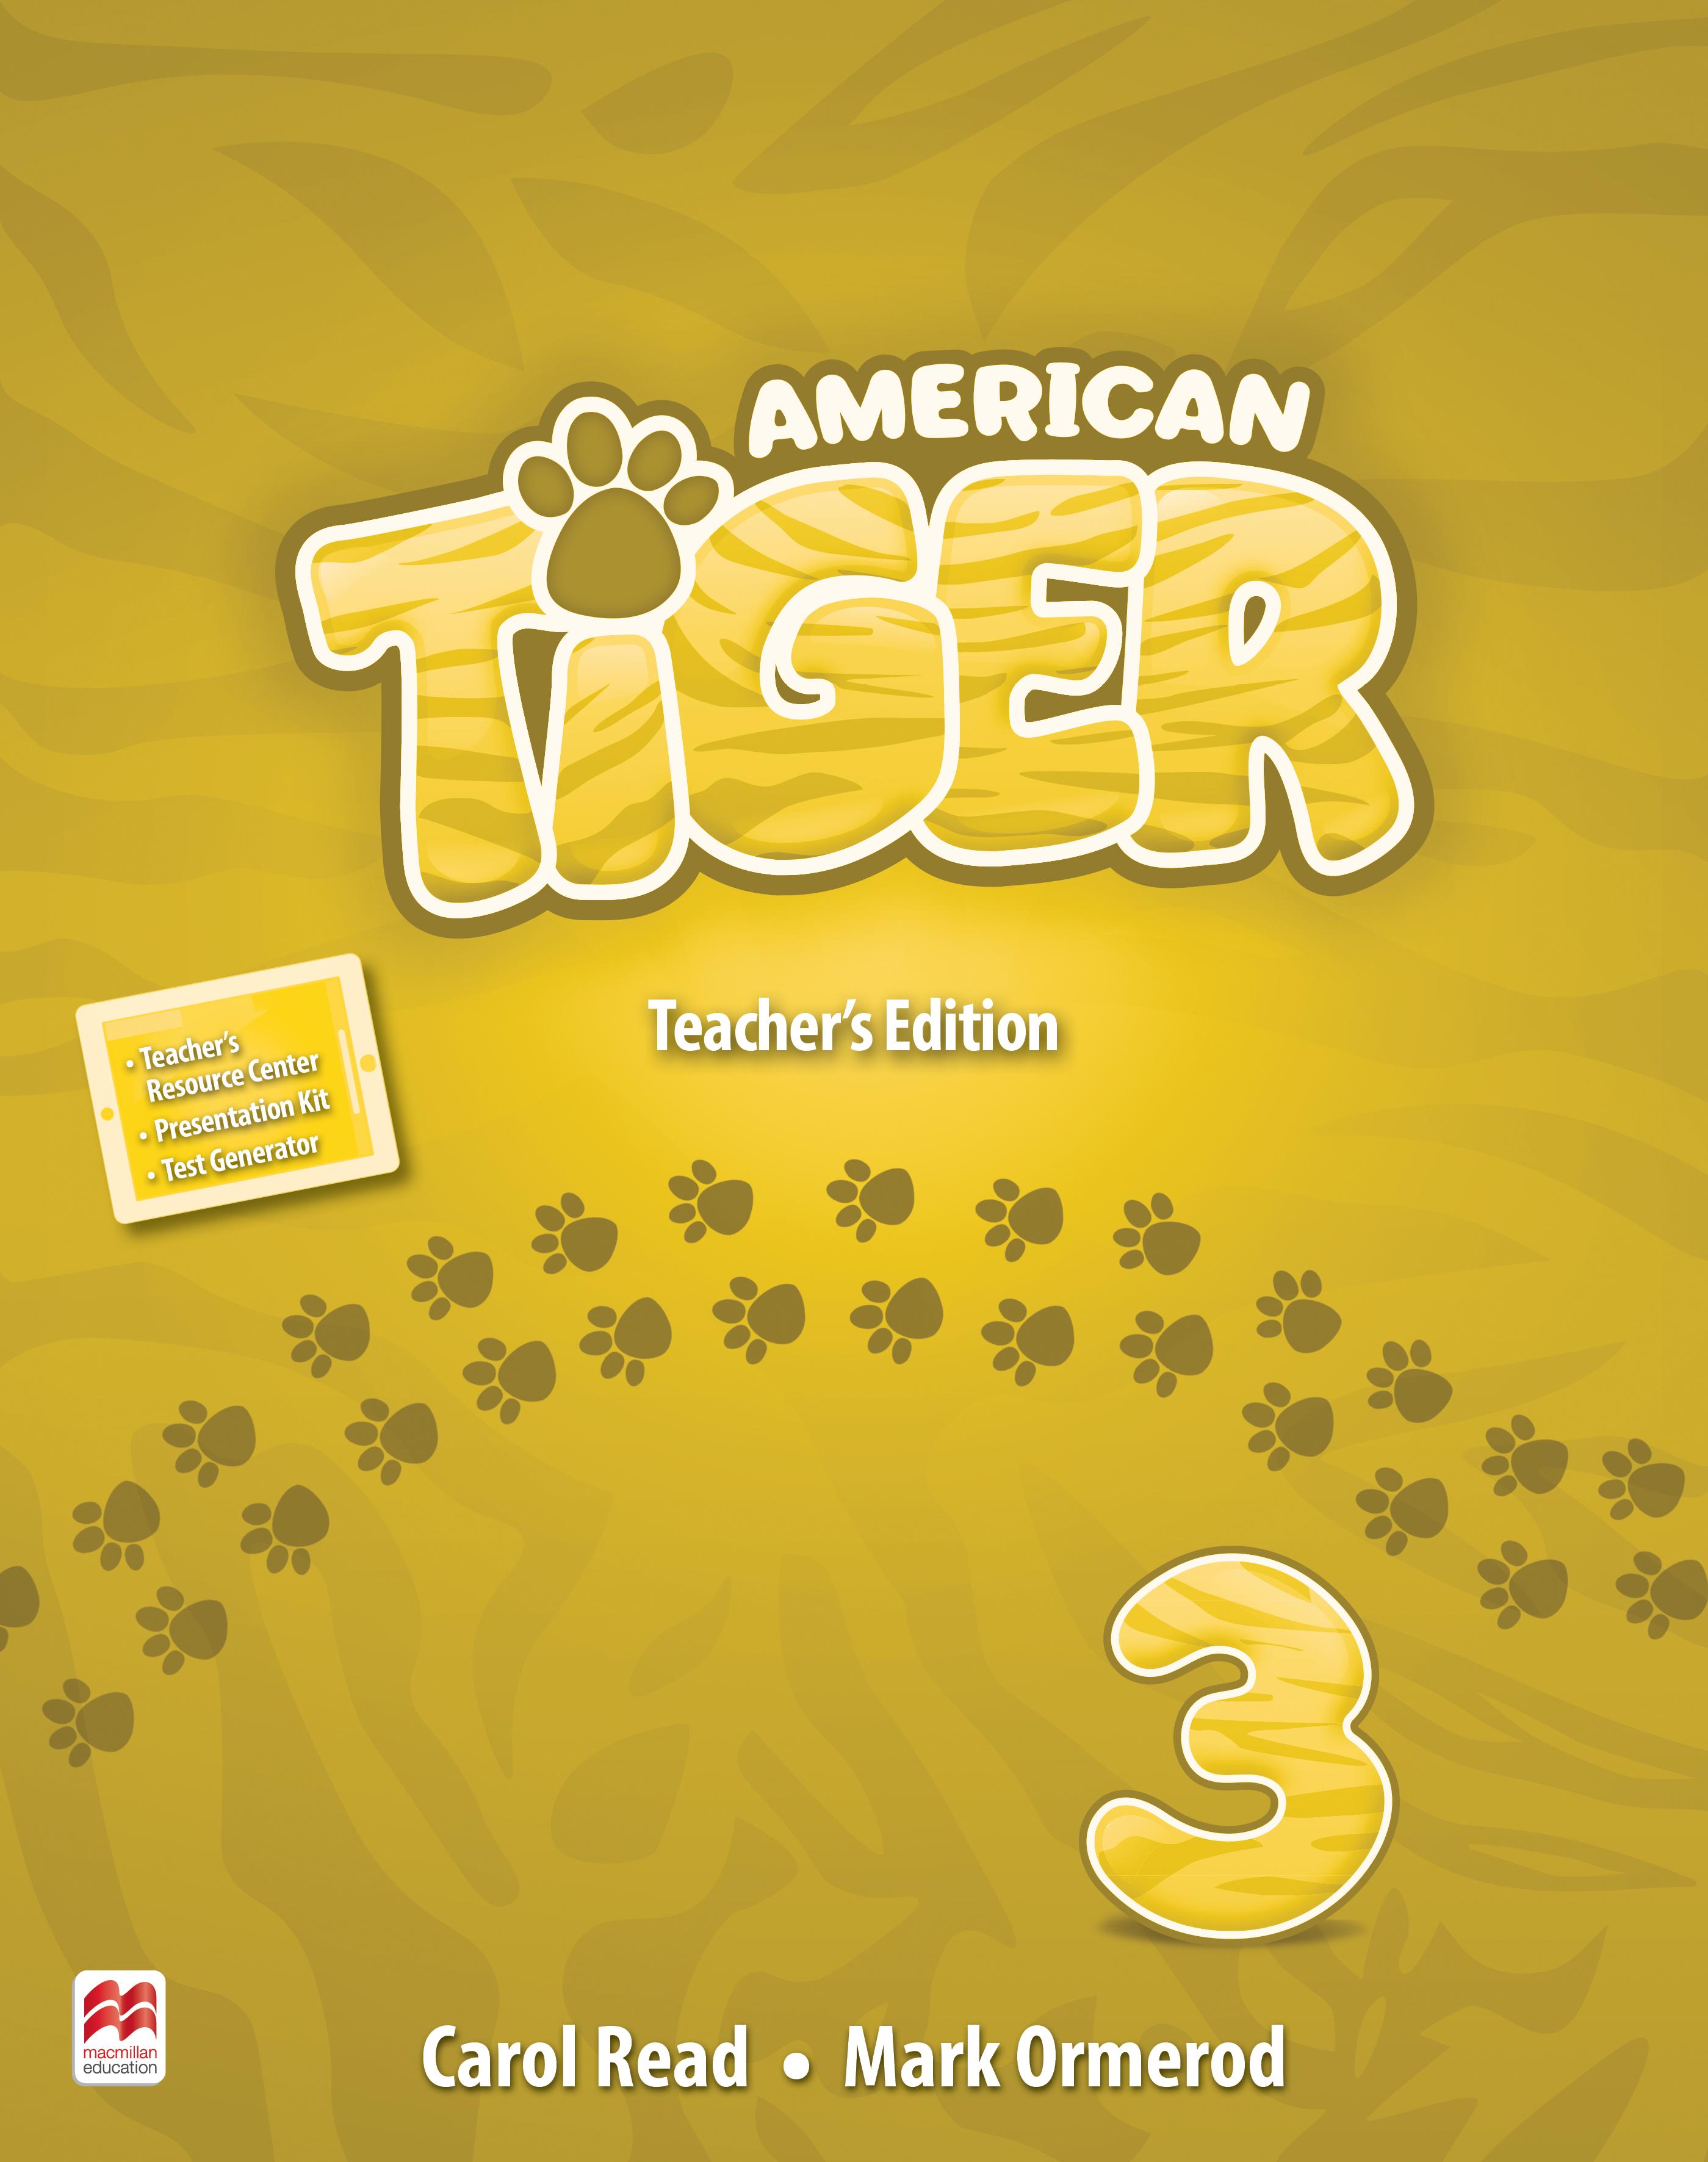 American Tiger Level 3 Teacher